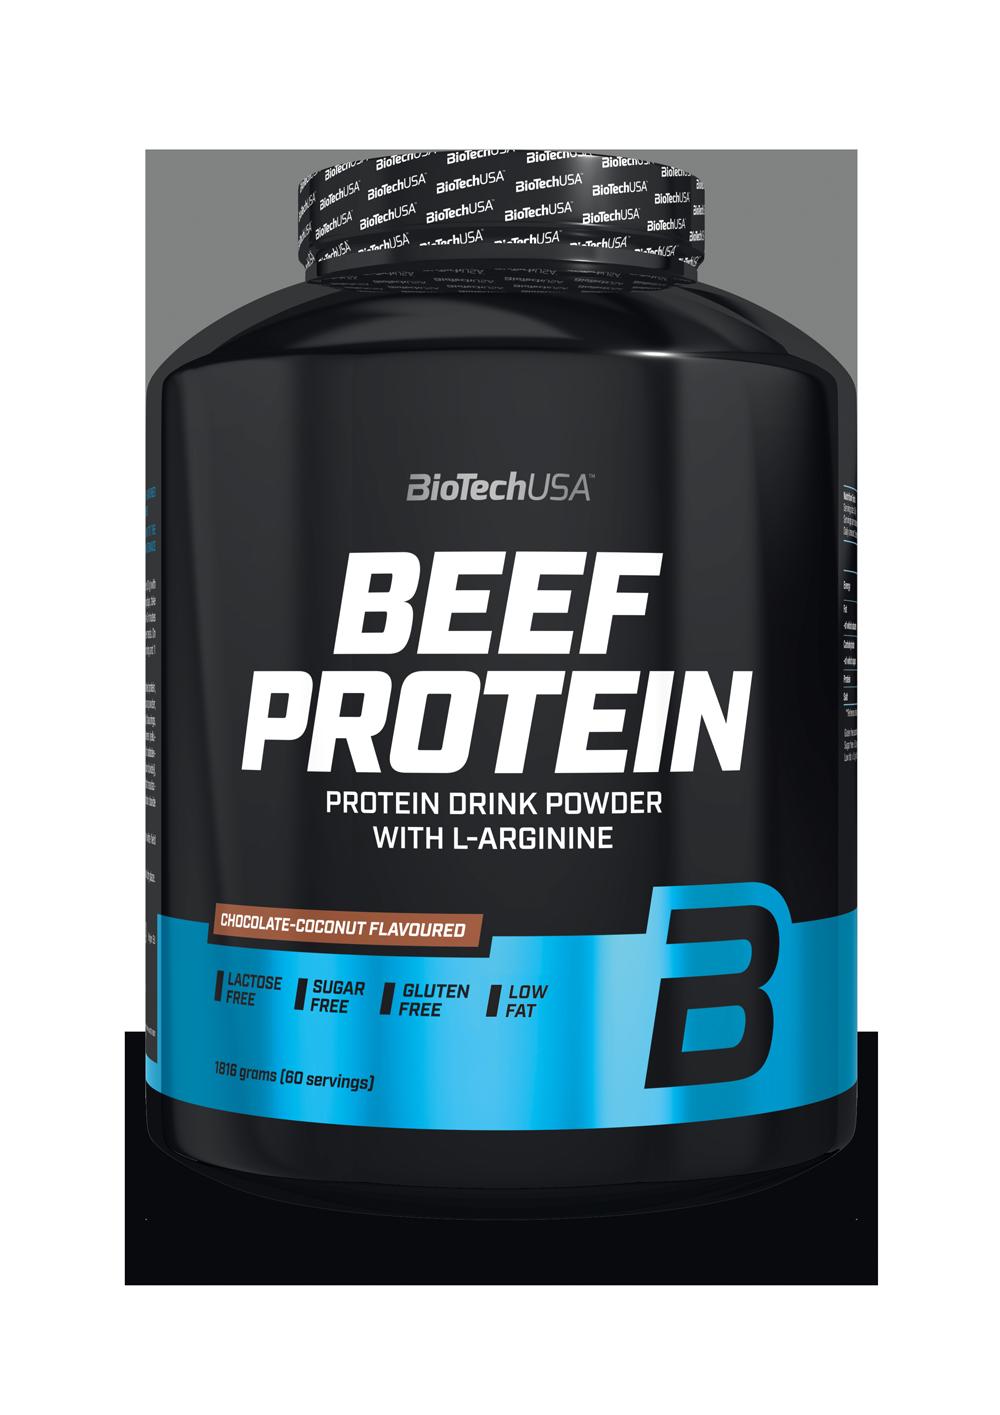 BioTech USA Beef Protein 1,816 kg